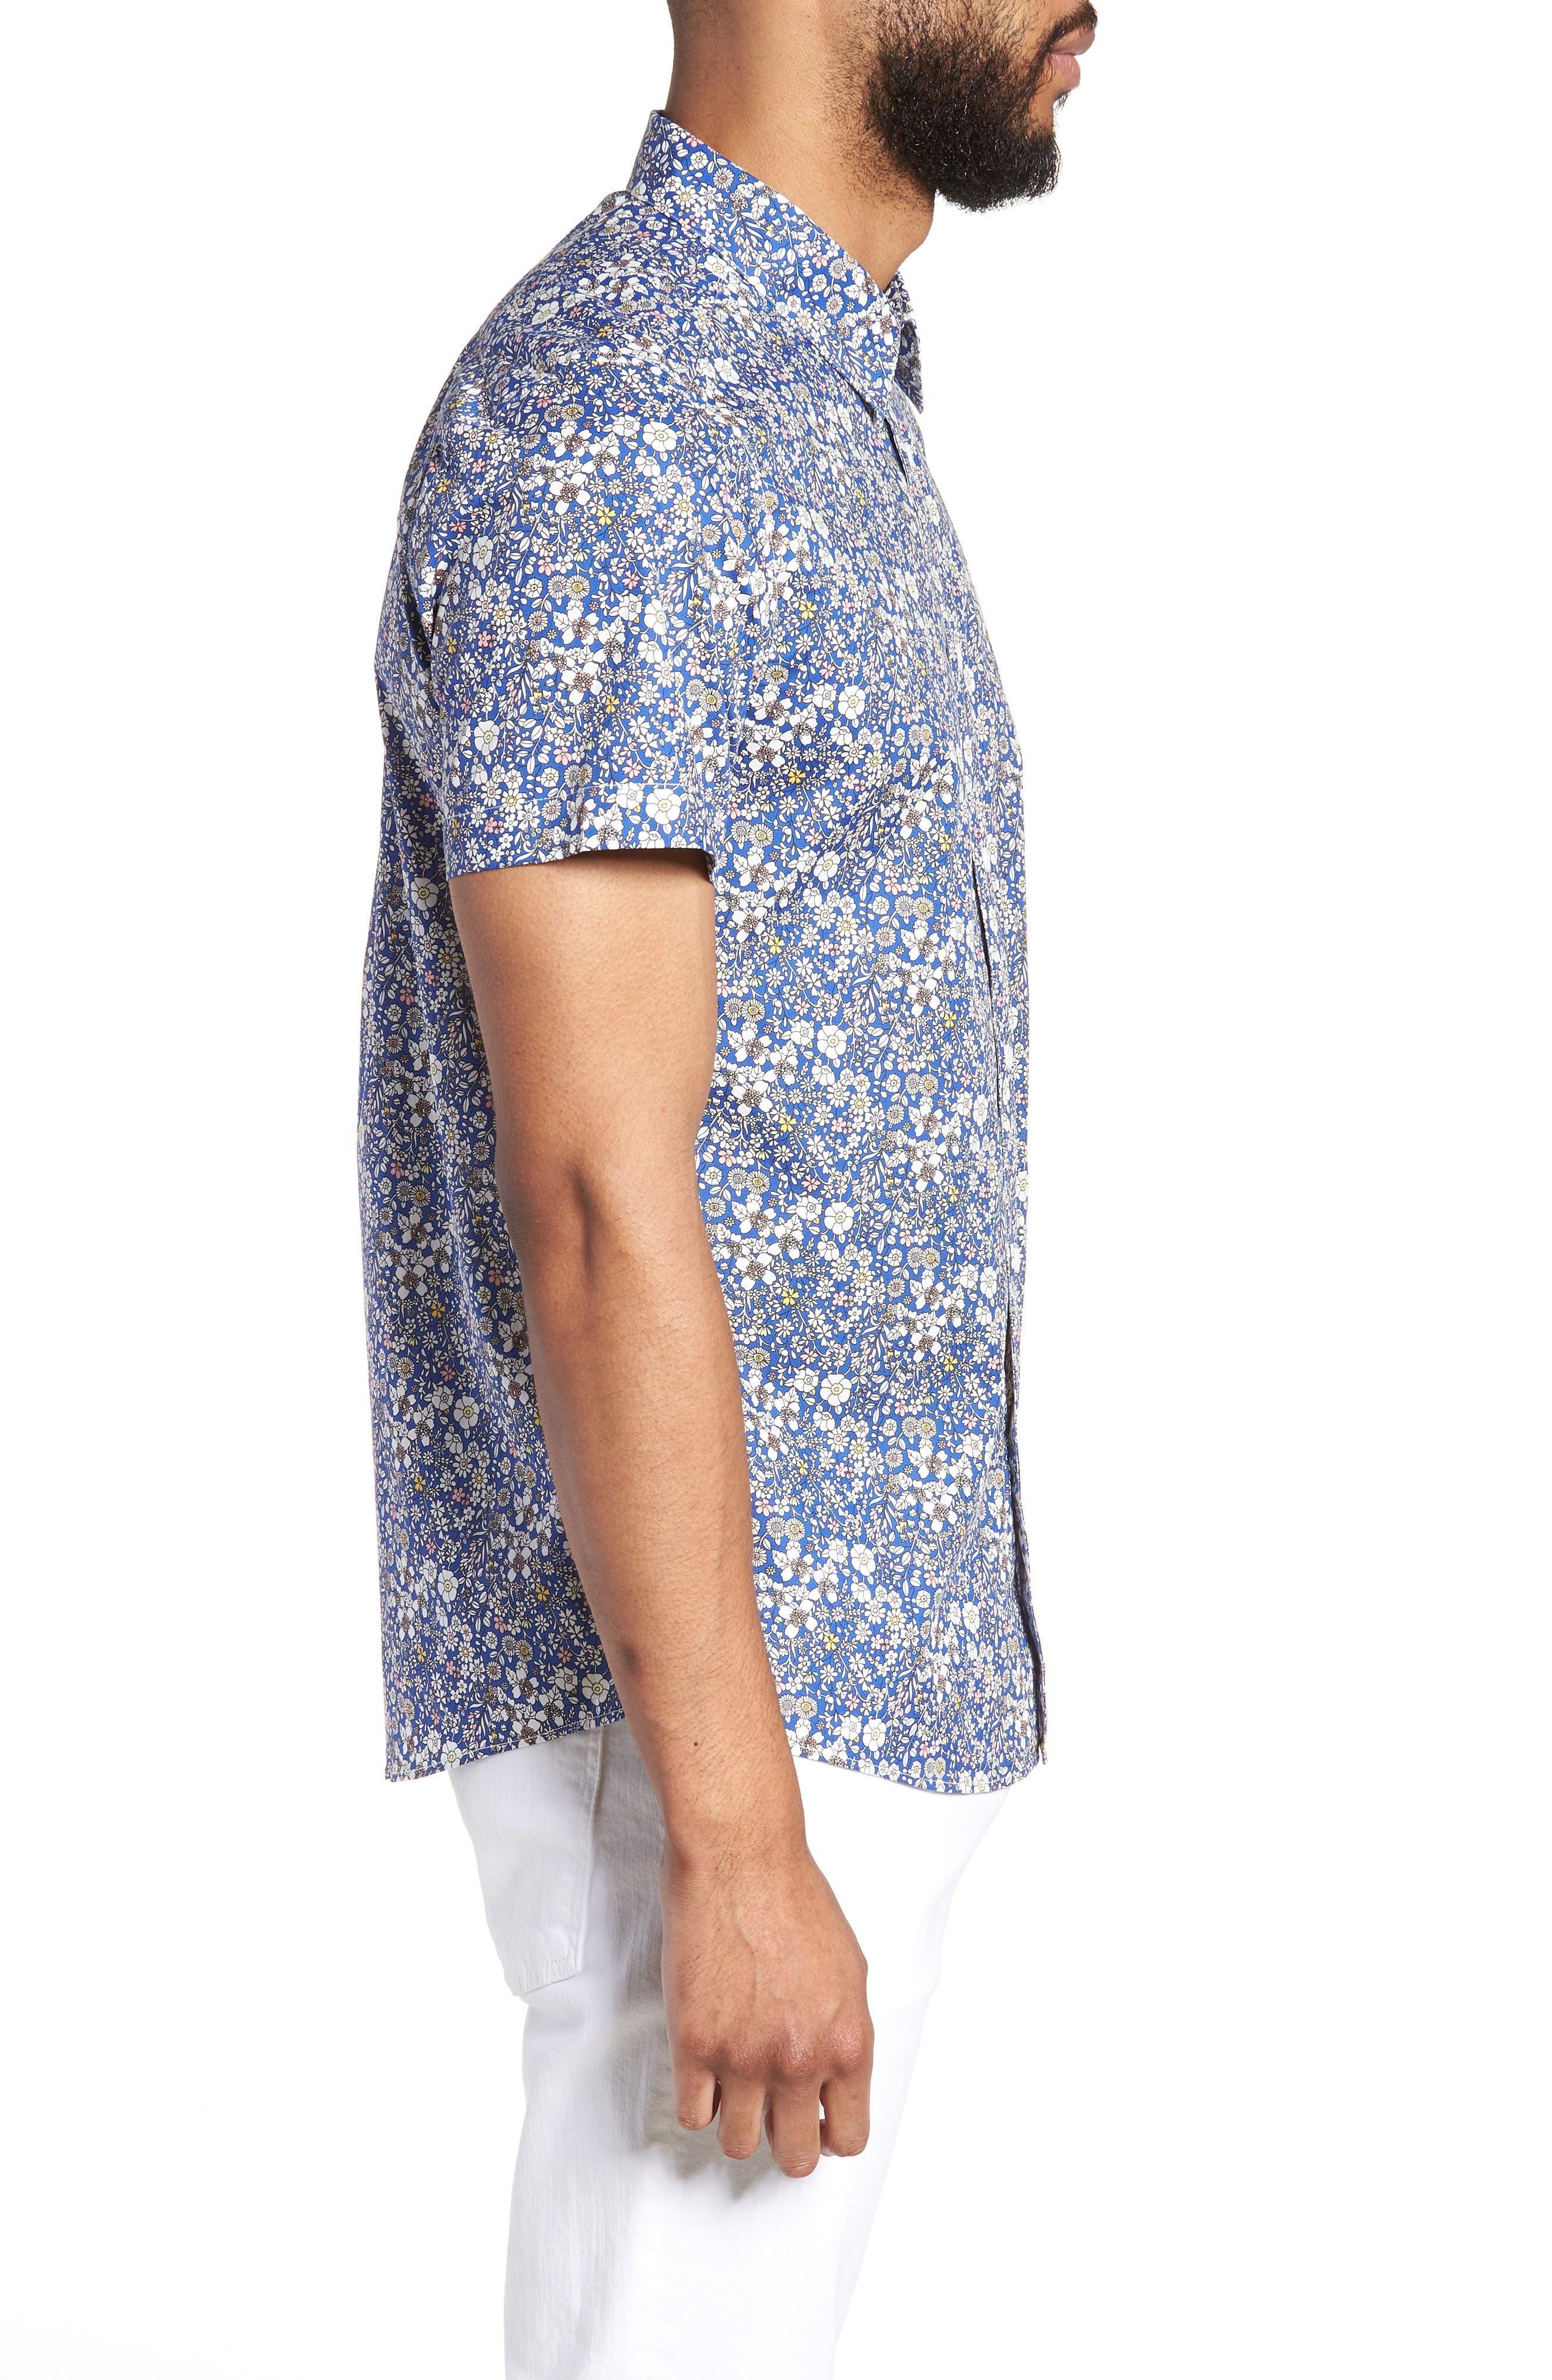 Trim Fit Print Woven Short Sleeve Shirt,                             Alternate thumbnail 3, color,                             Blue Pink Floral